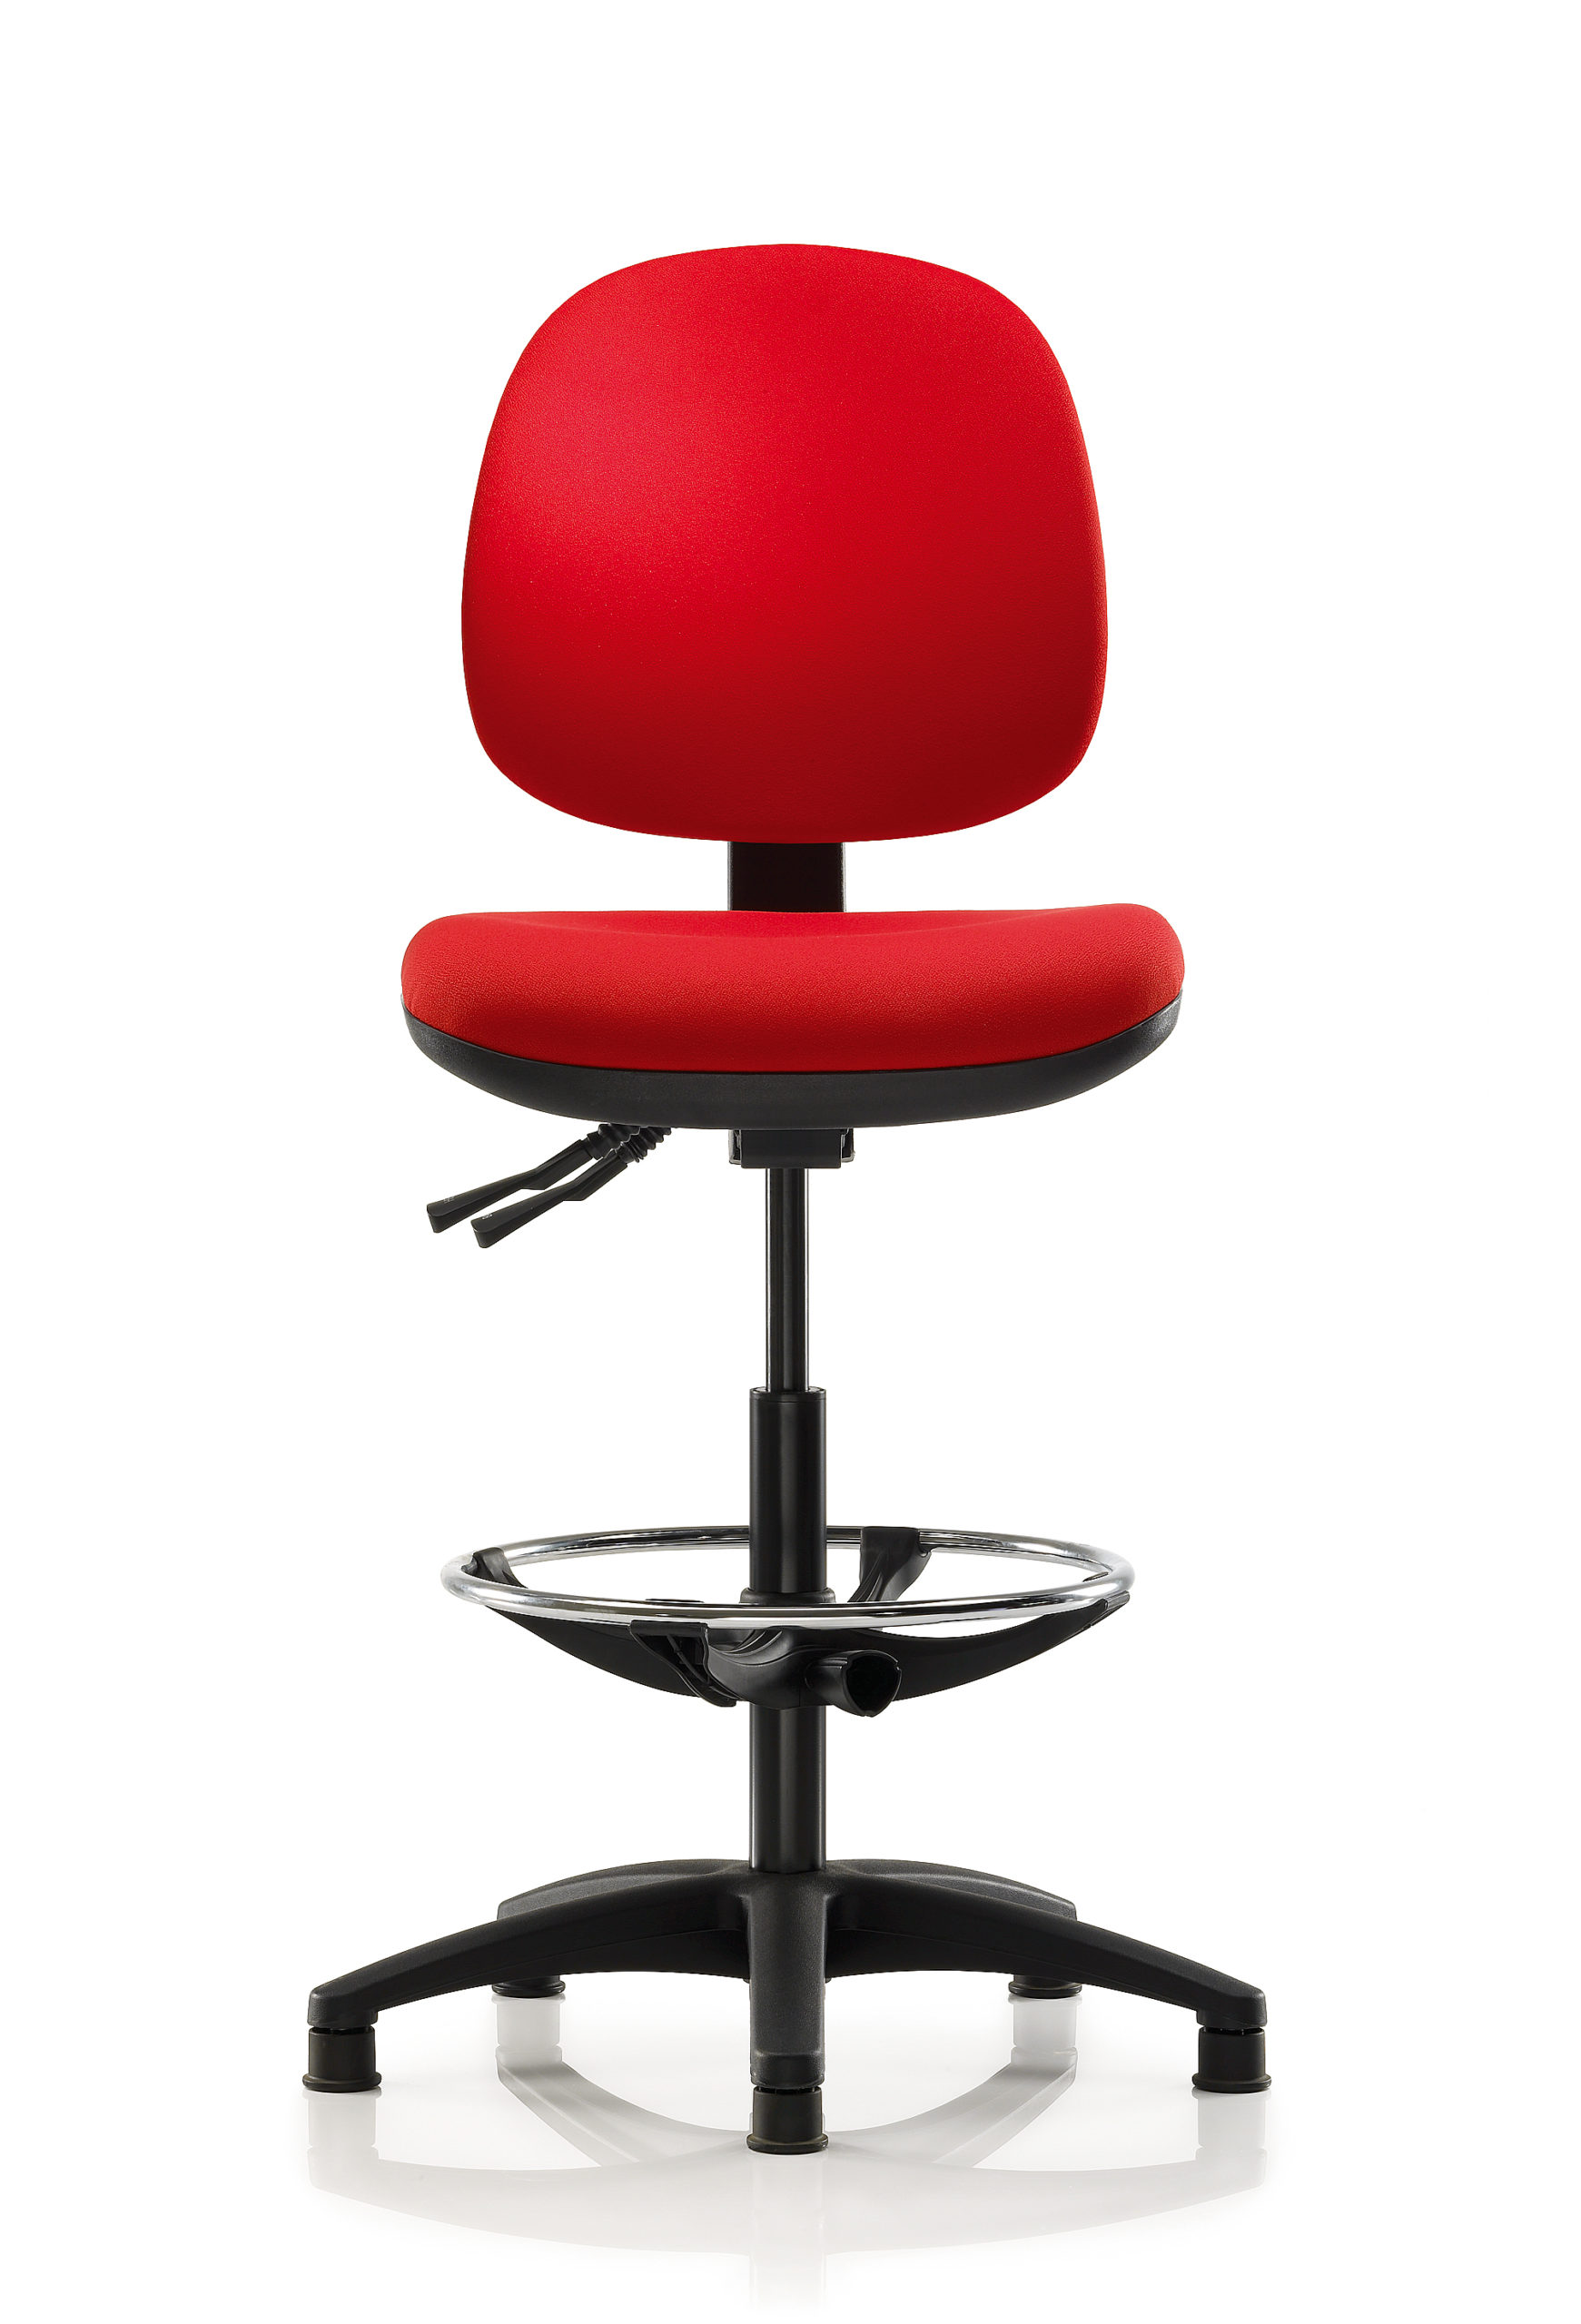 Topaz Draughtsman's Chair